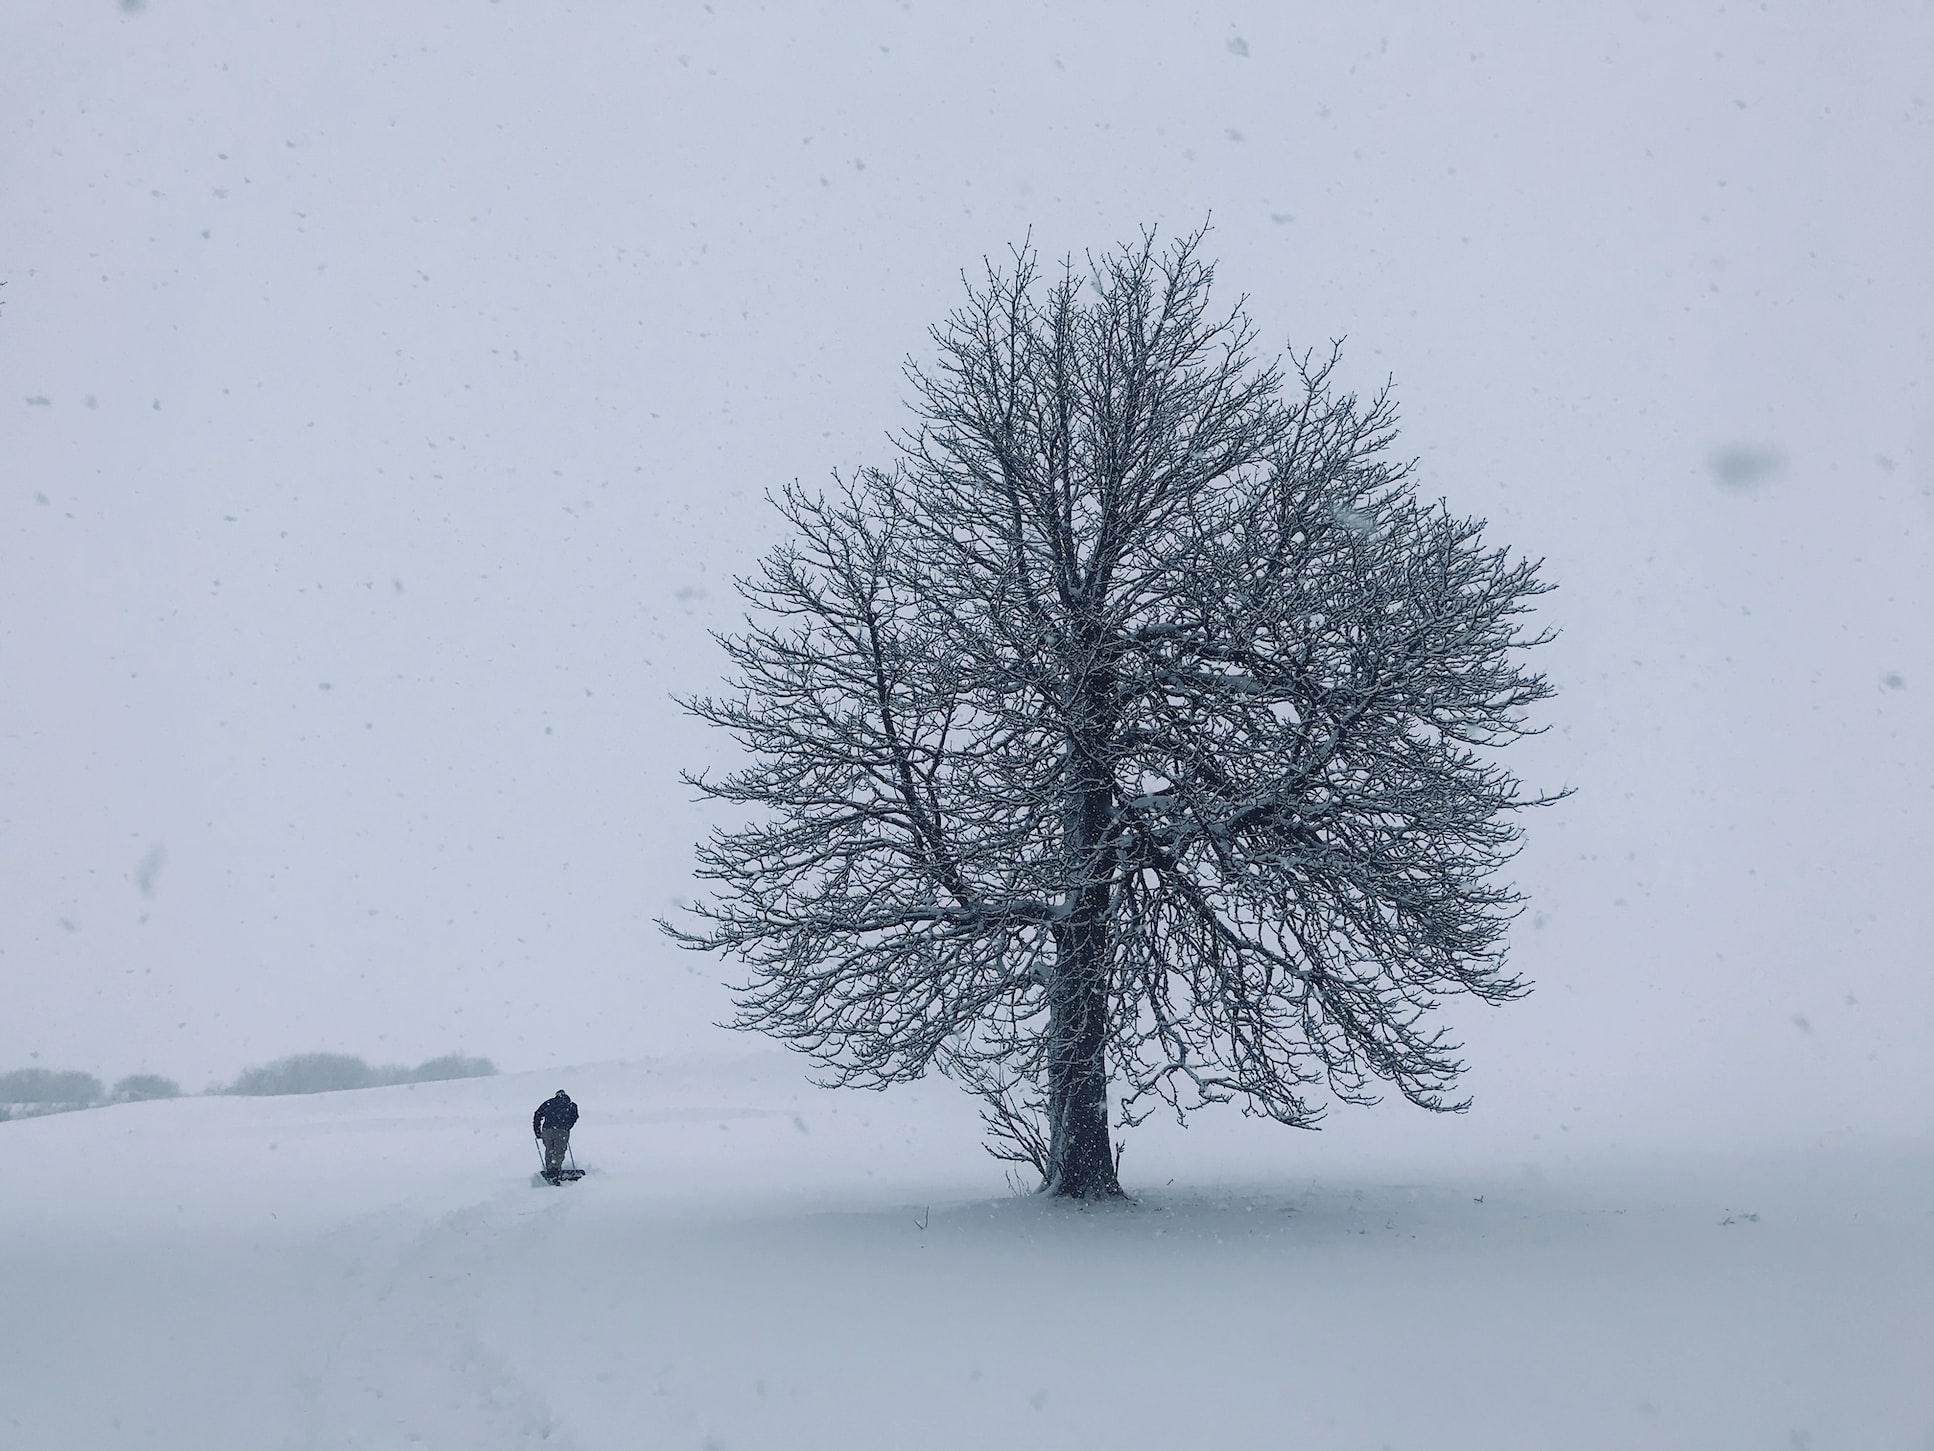 Do not freeze | Lithuania tech weekly #2